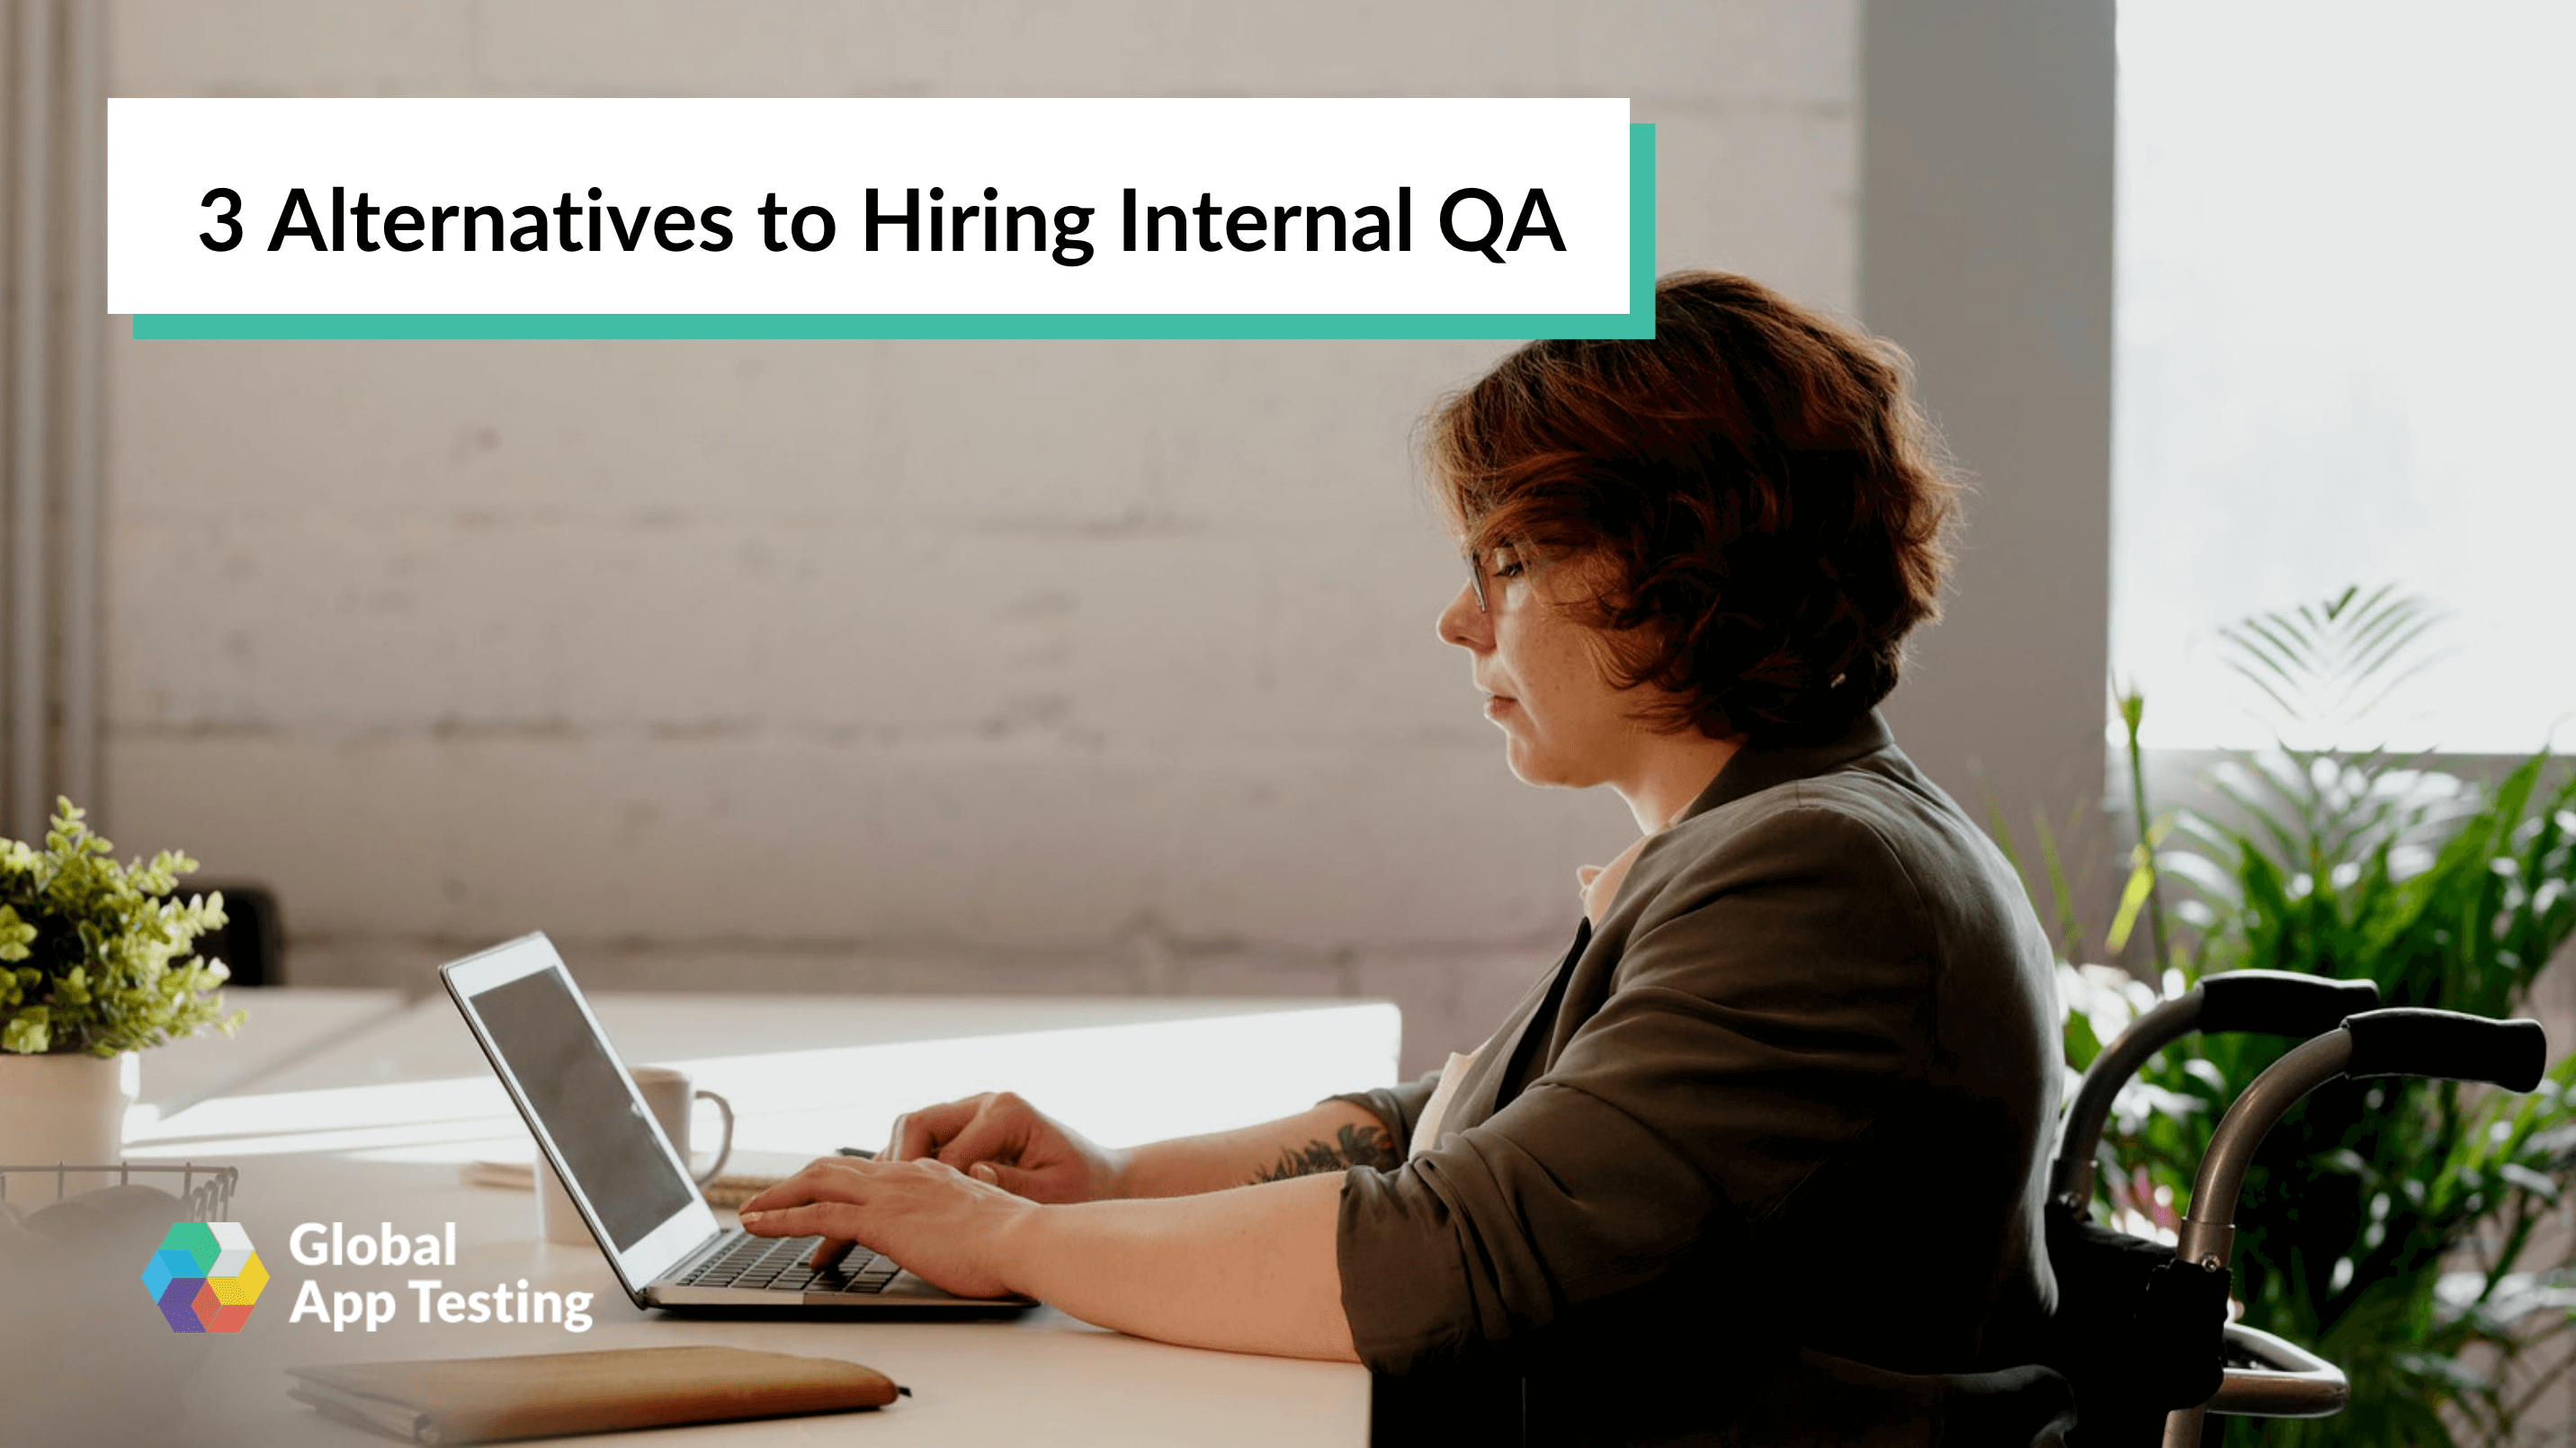 3 Alternatives to Hiring Internal QA